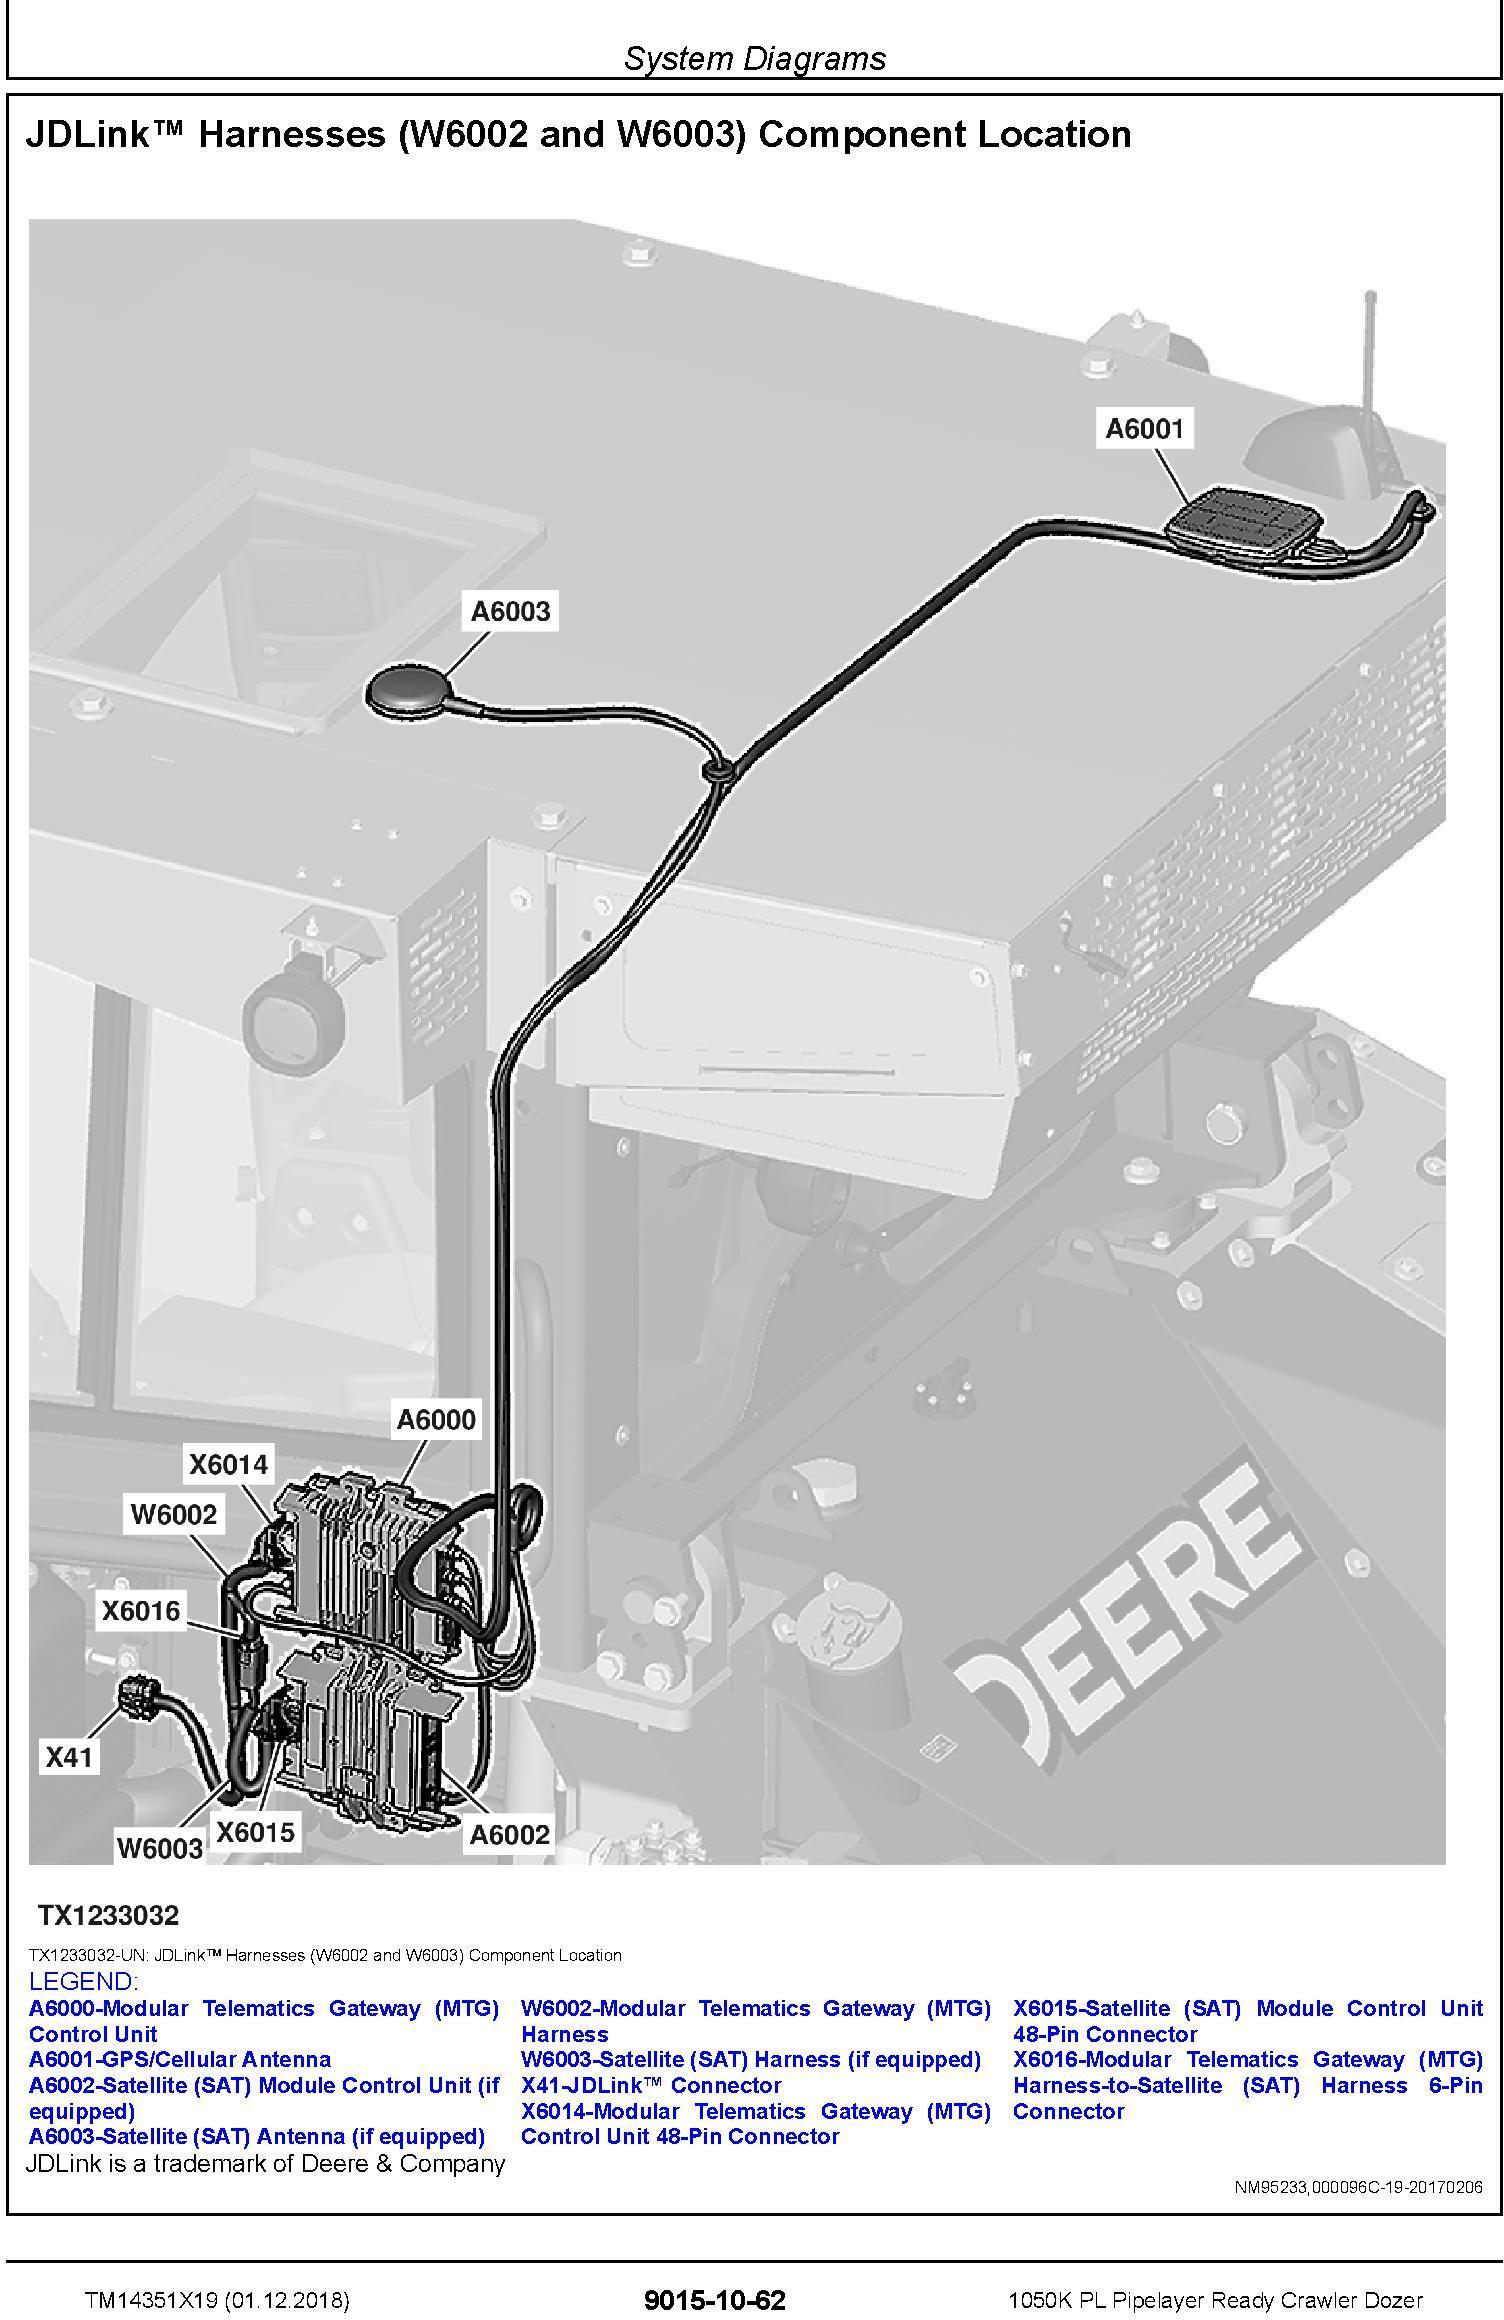 John Deere 1050K PL (SN. F318802-) Pipelayer Ready Crawler Dozer Diagnostic Manual (TM14351X19) - 2